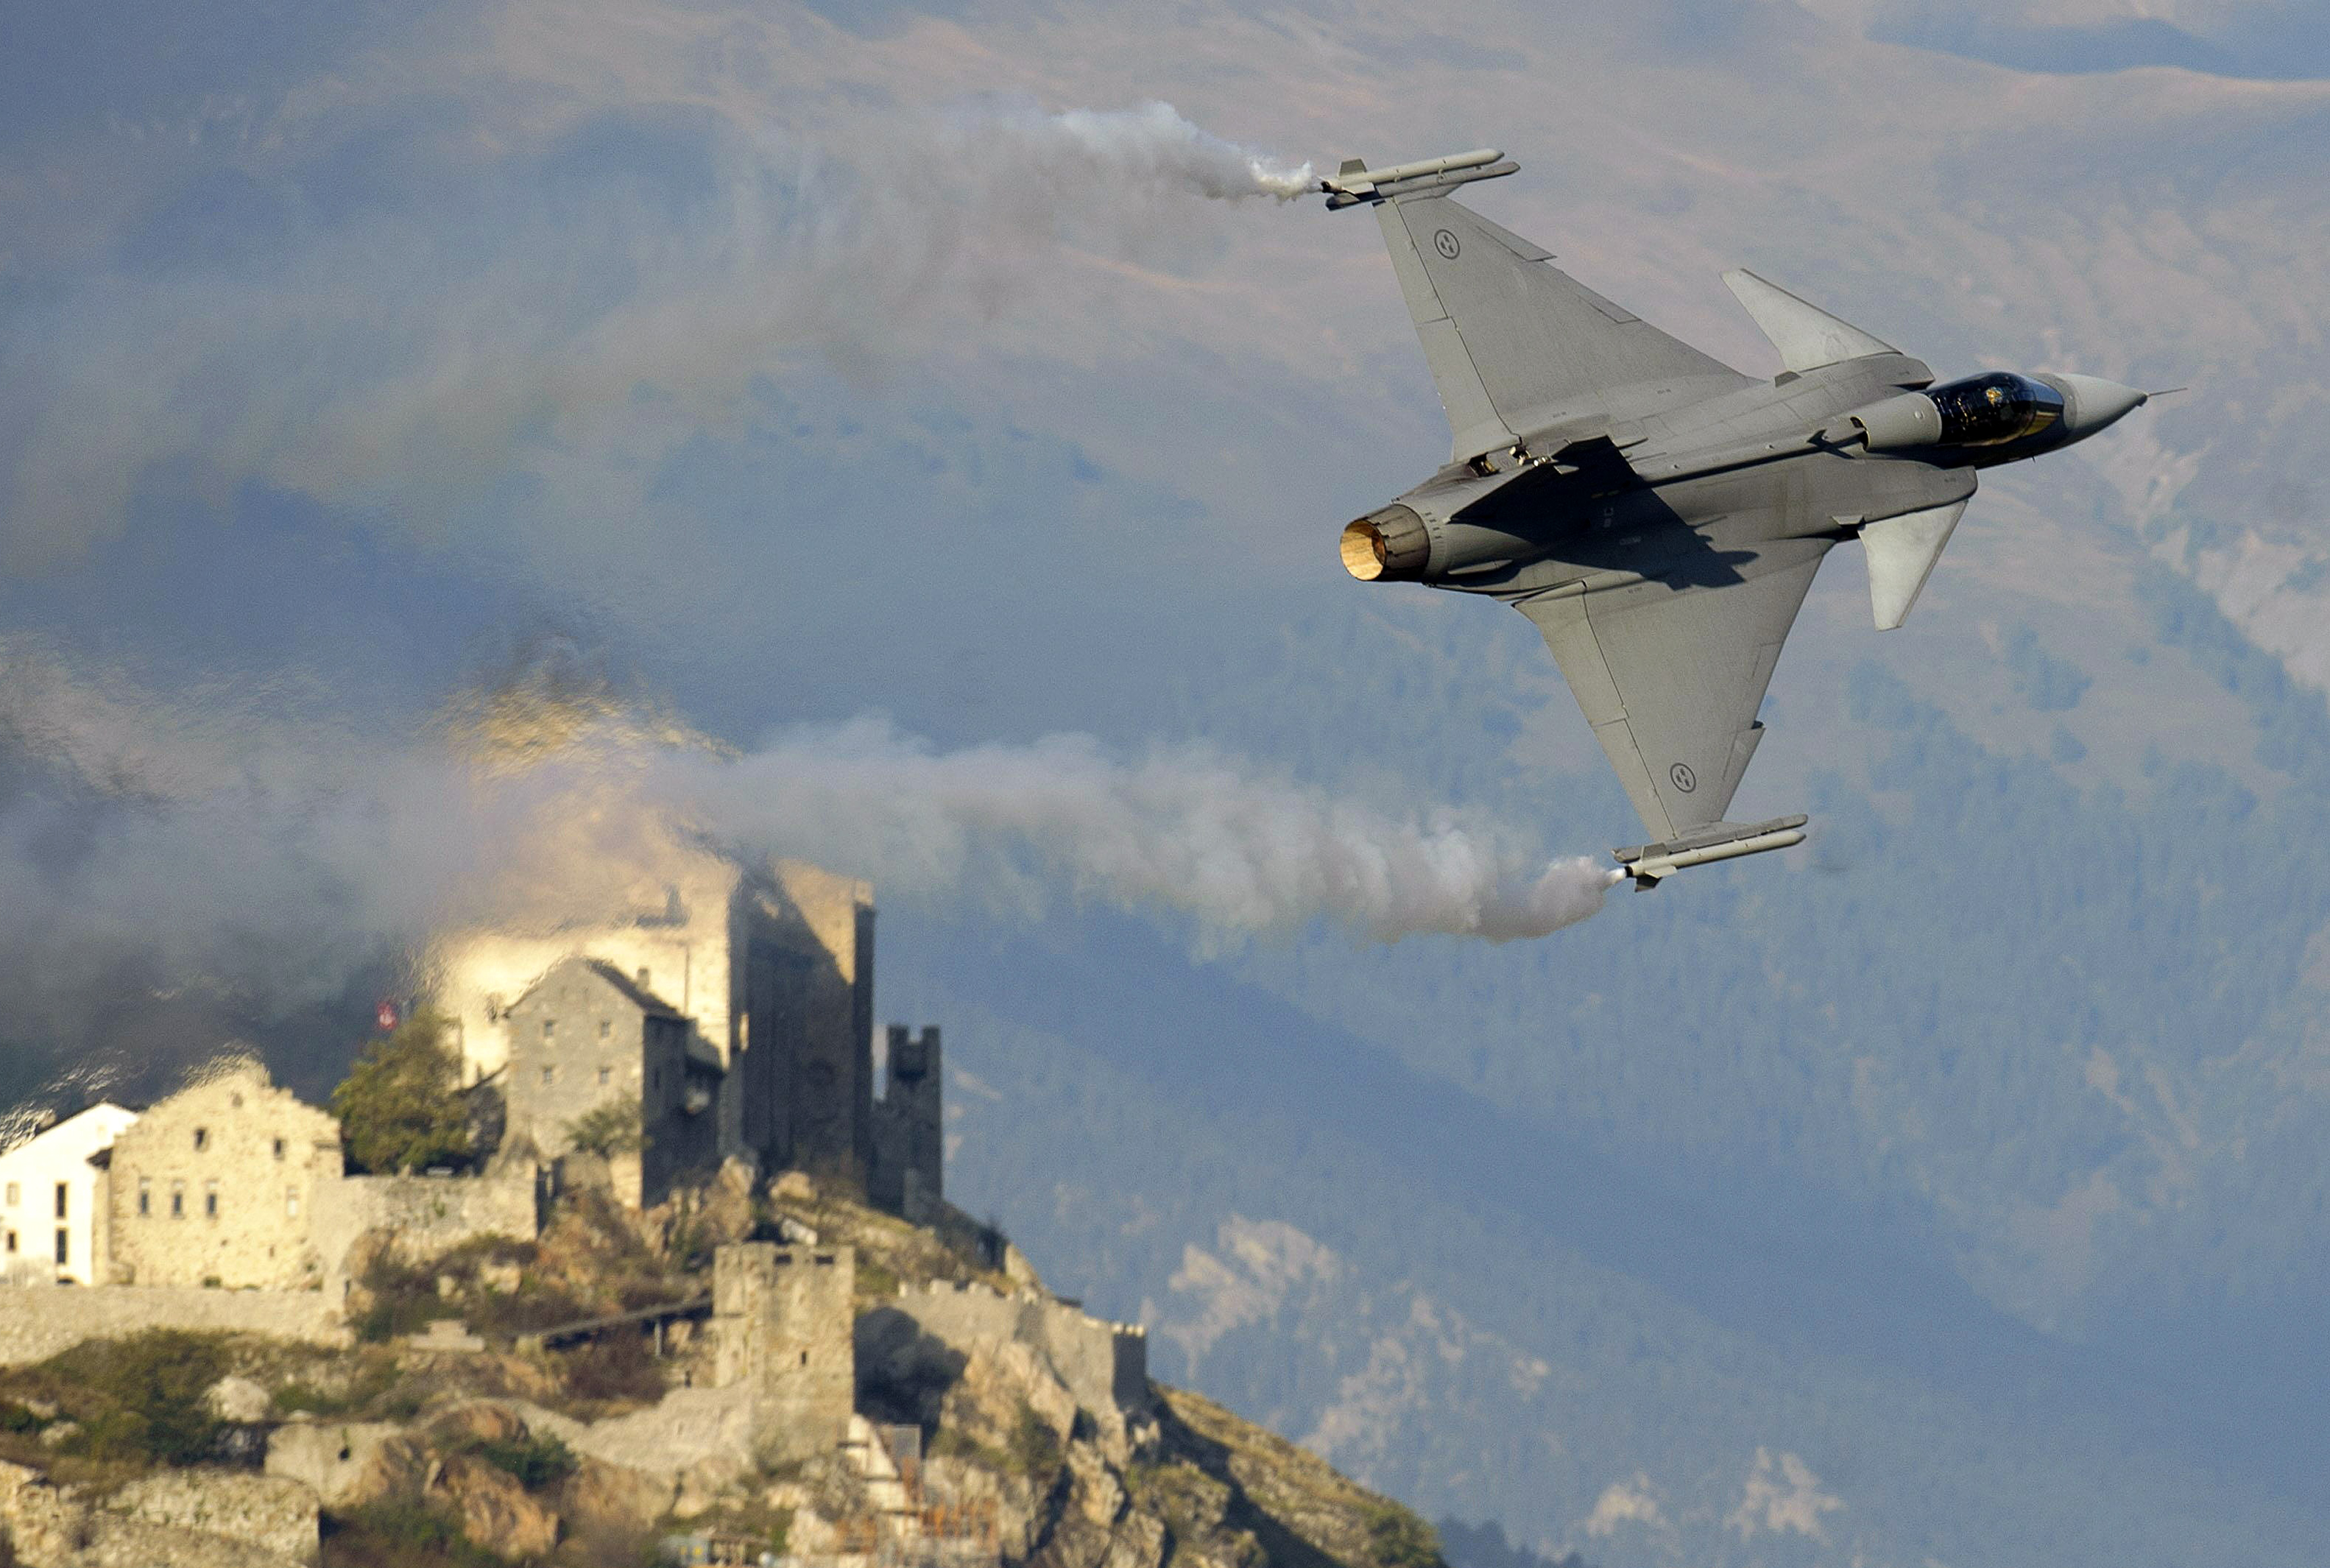 Sweden joins the British Jet-fighter program | New Europe